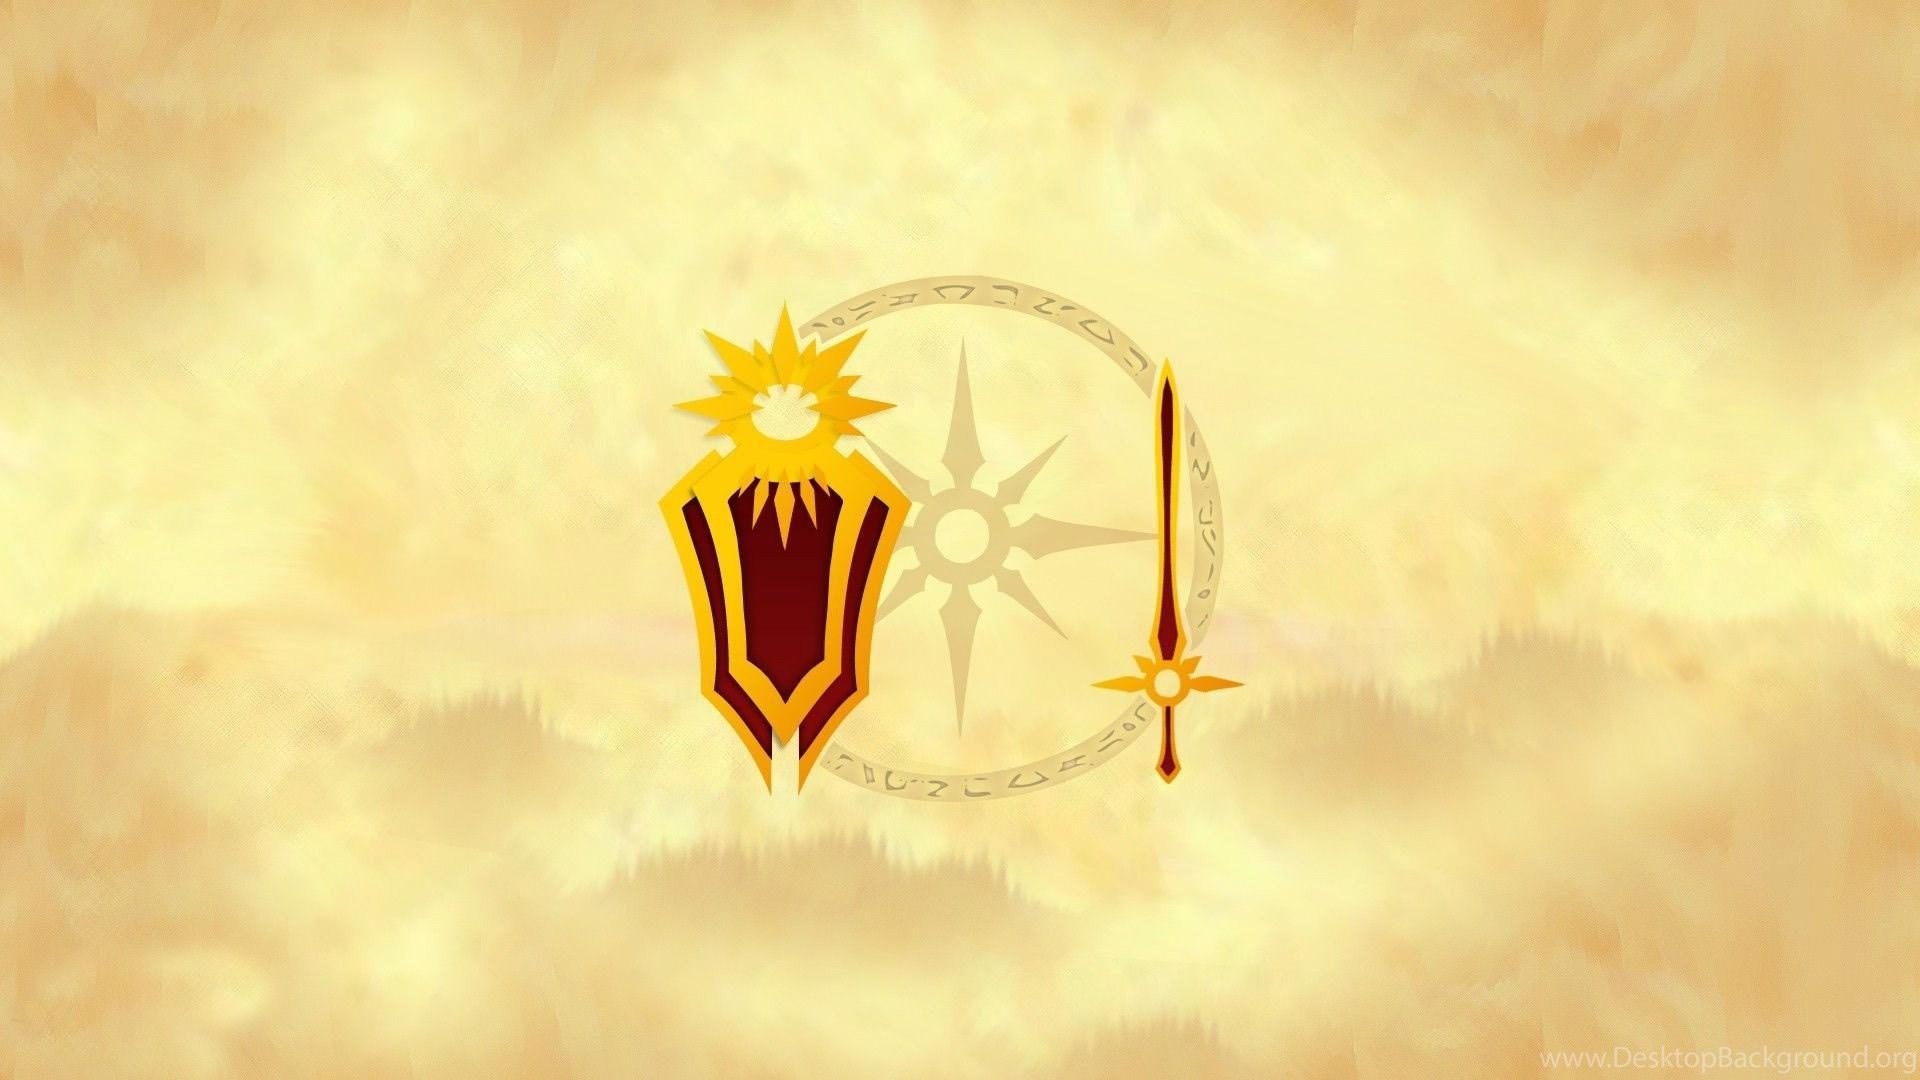 Leona League Of Legends Wallpapers » WallDevil Best Free HD ...